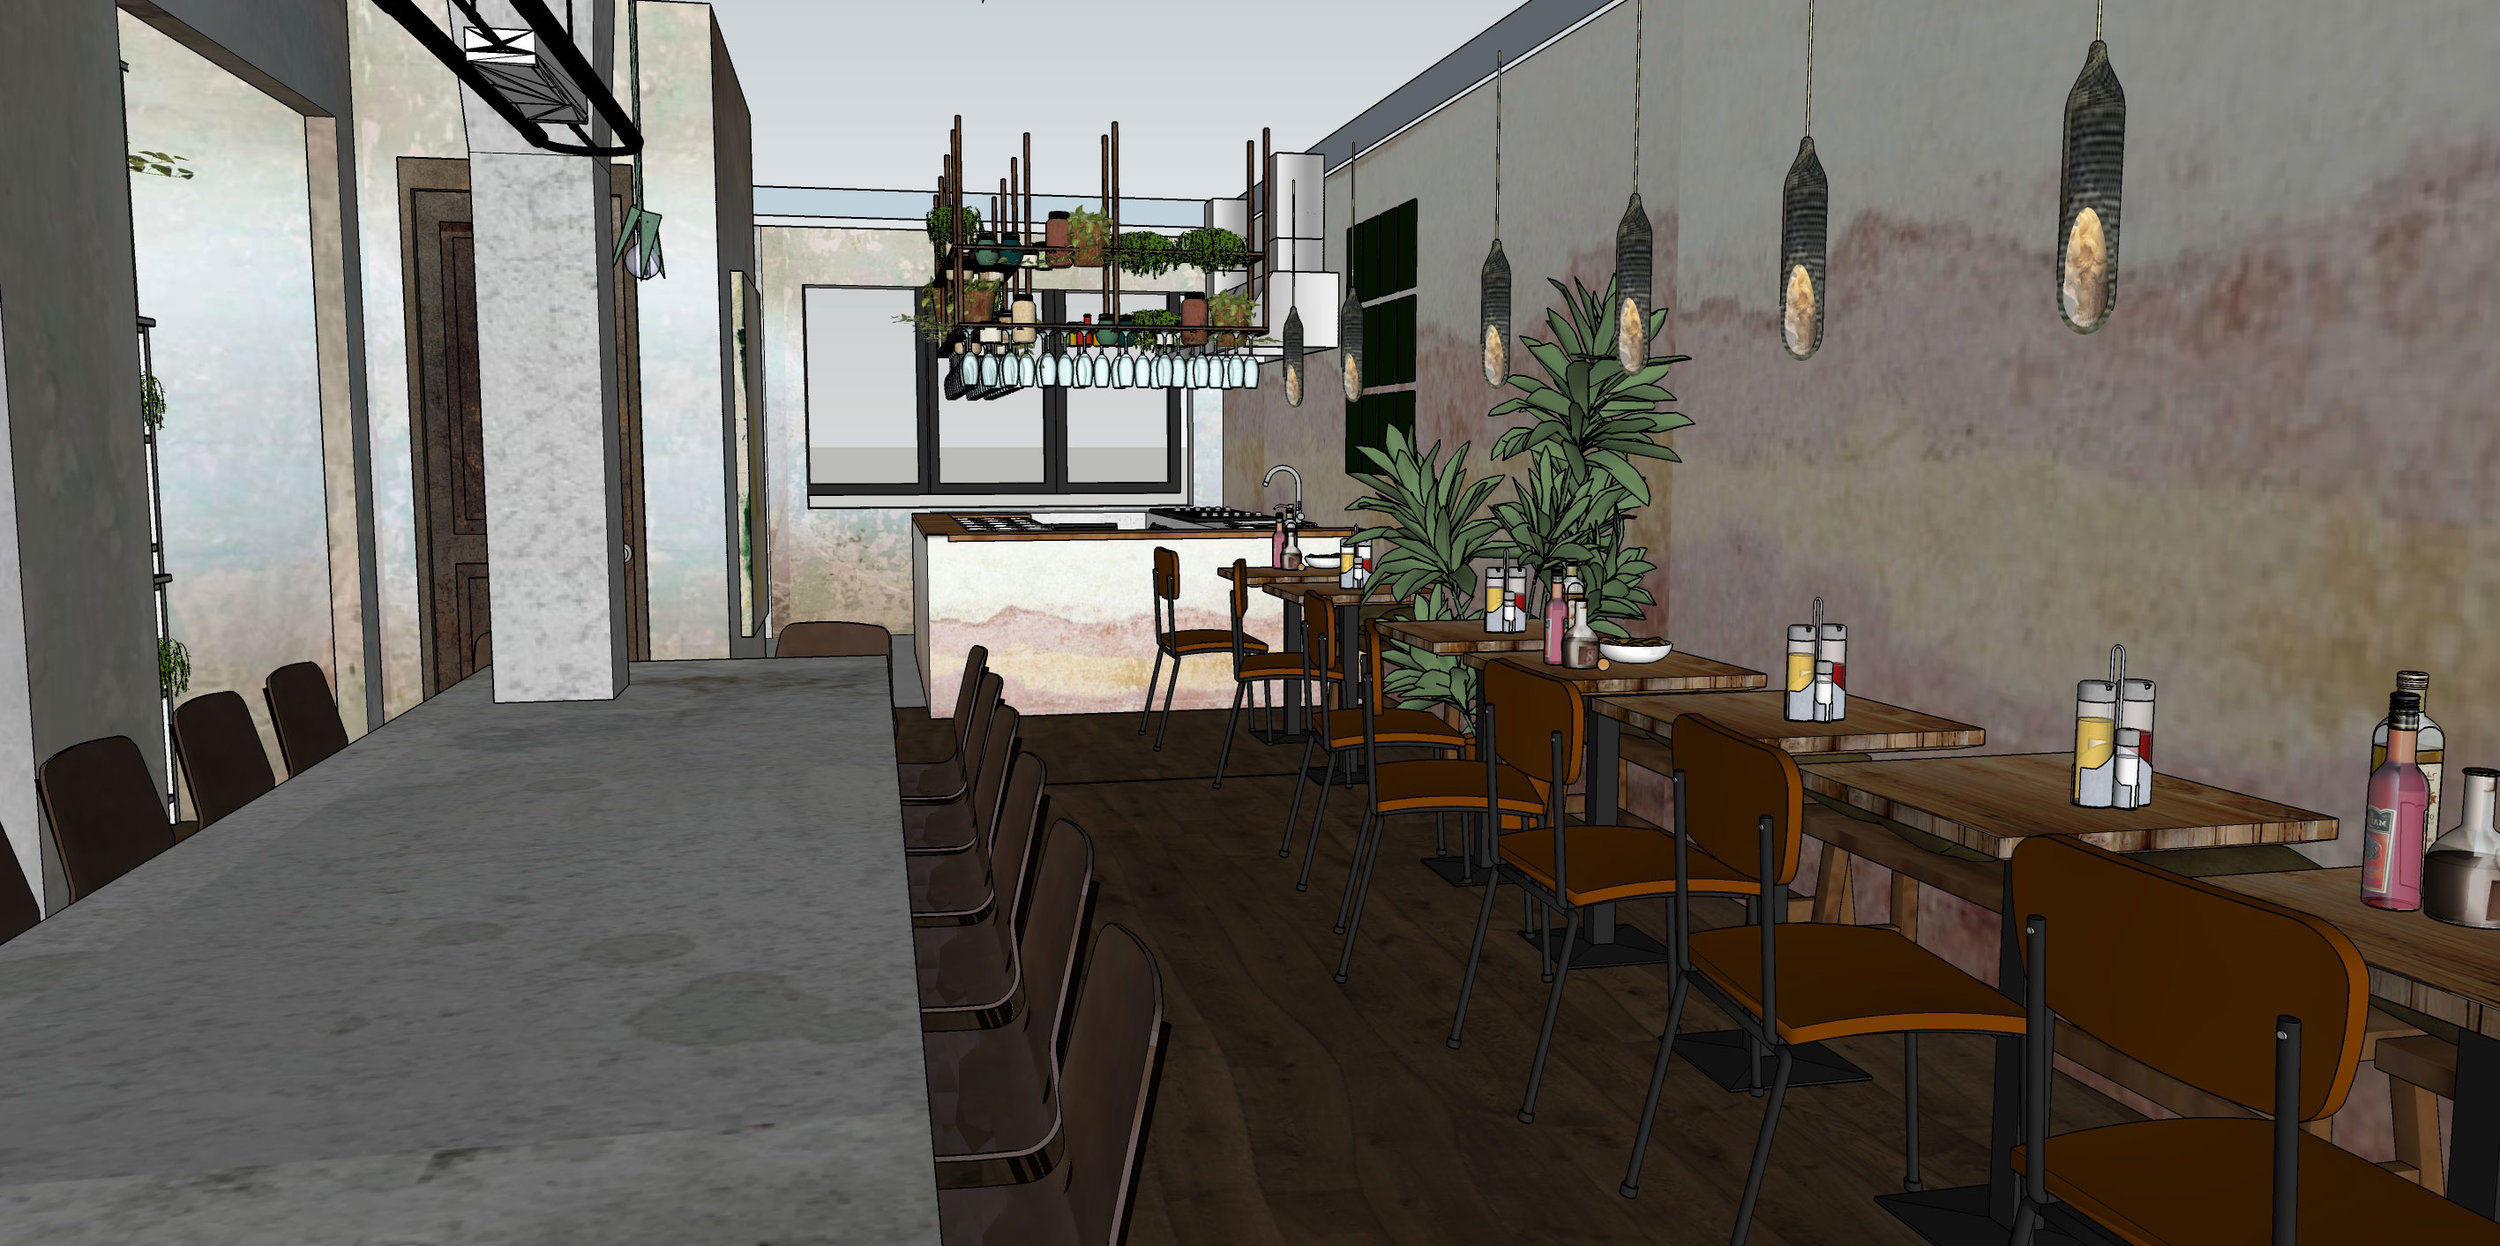 StudioNoun-InteriorDesignProject-Restaurant-Soil_1.jpg